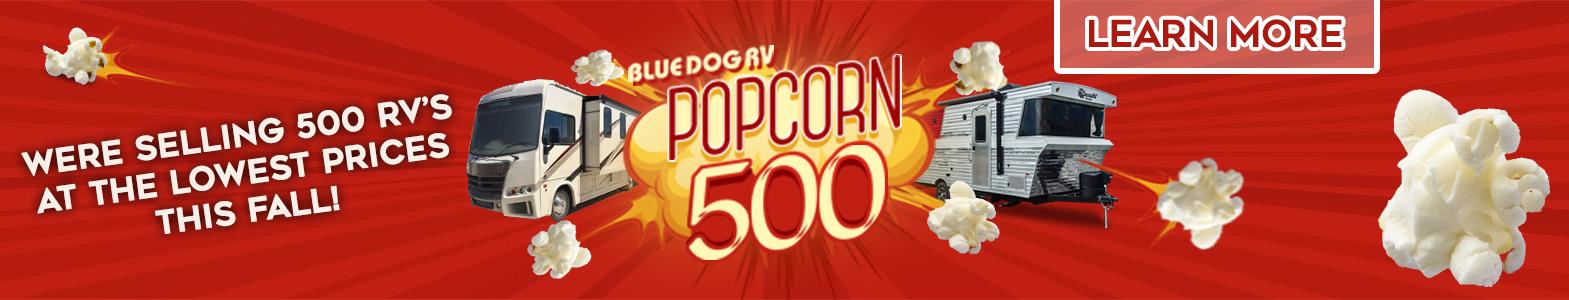 Blue Dog RV Popcorn 500 Banner